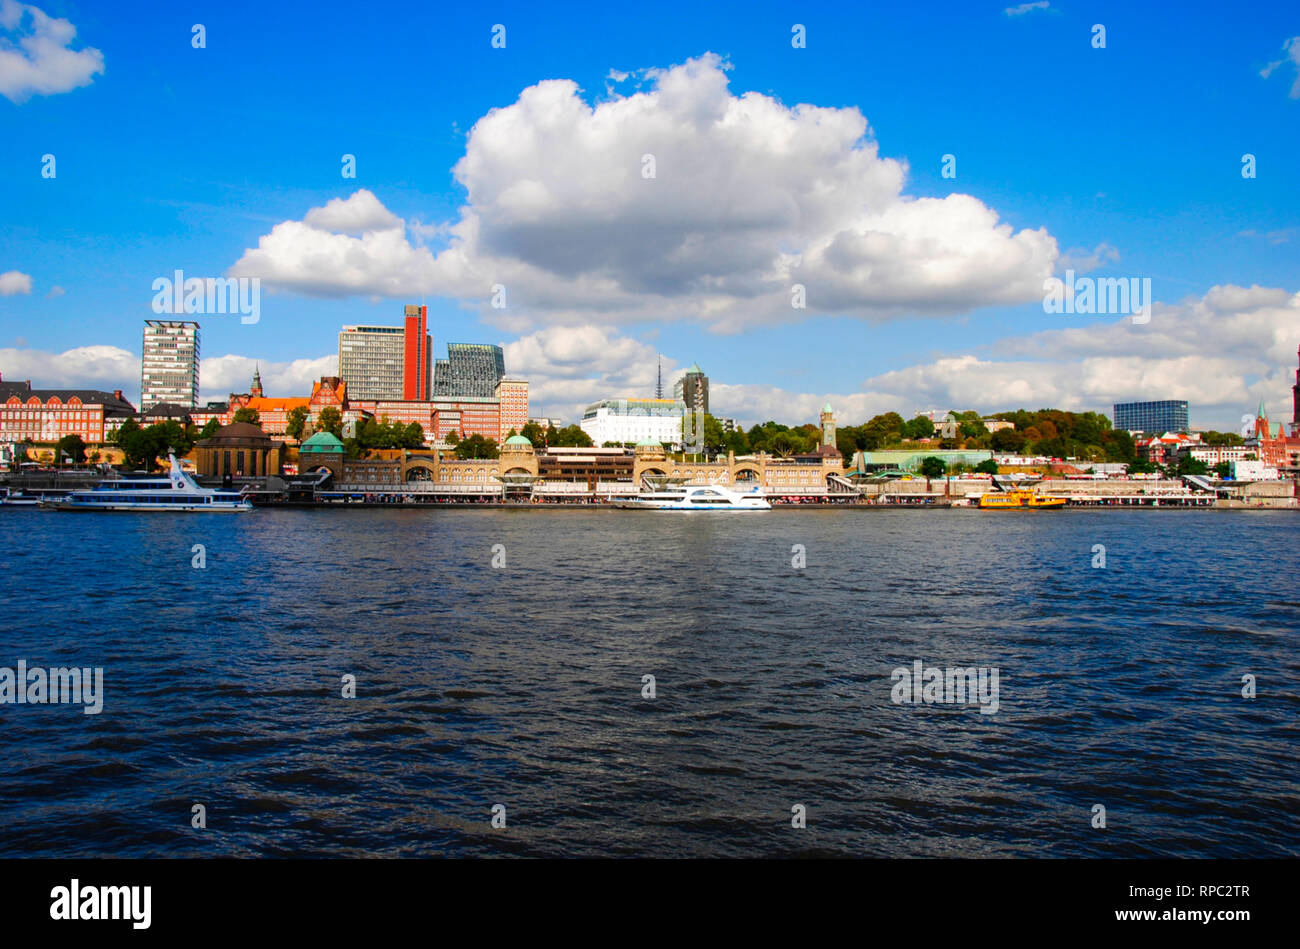 panorama view on the Landungsbrücken in Hamburg in Germany - Stock Image